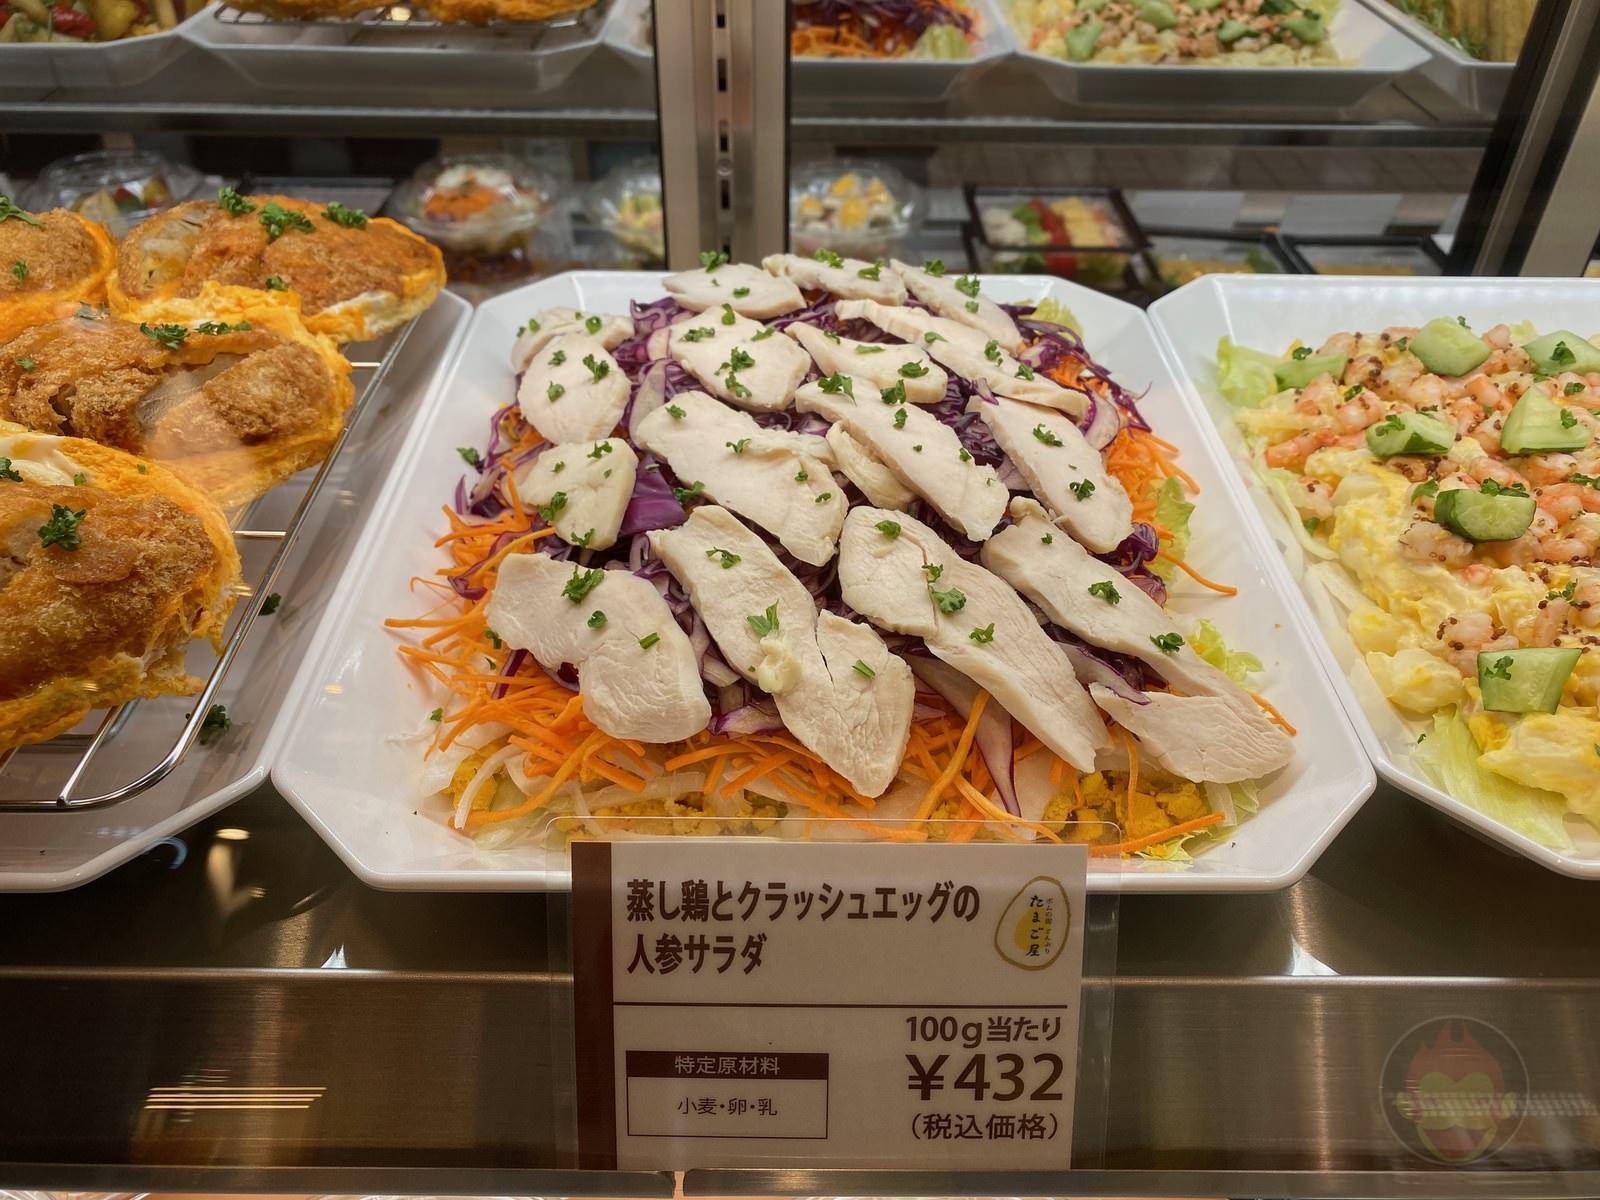 Shibuya-Scramble-Square-Food-I-Ate-111.jpeg